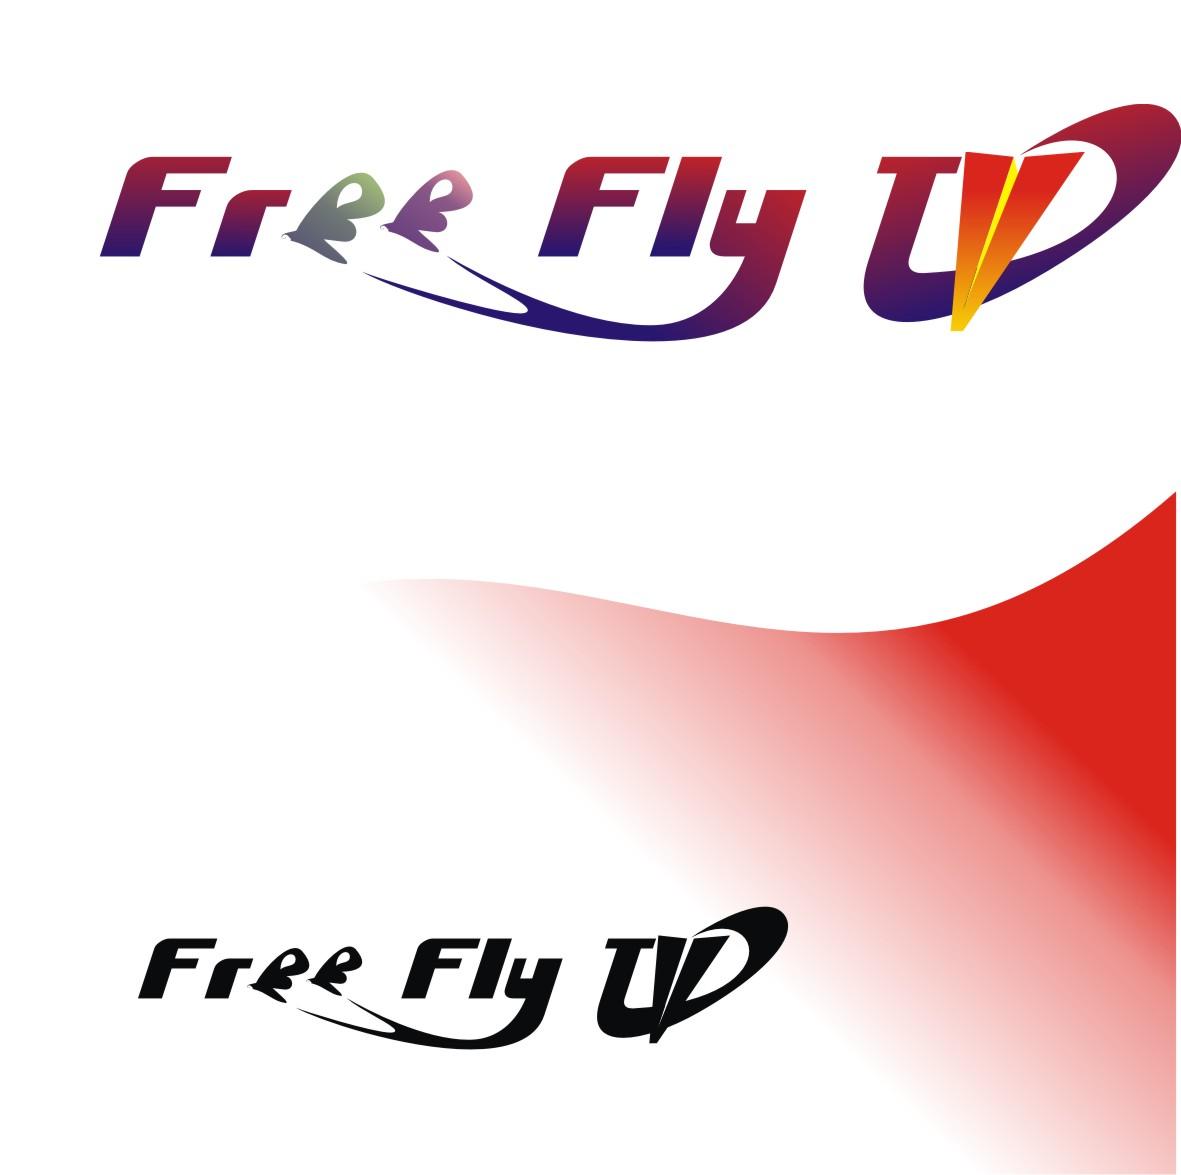 Логотип для общественного интернет-телевидения FreeFly фото f_4f97d85a8d7ca.jpg